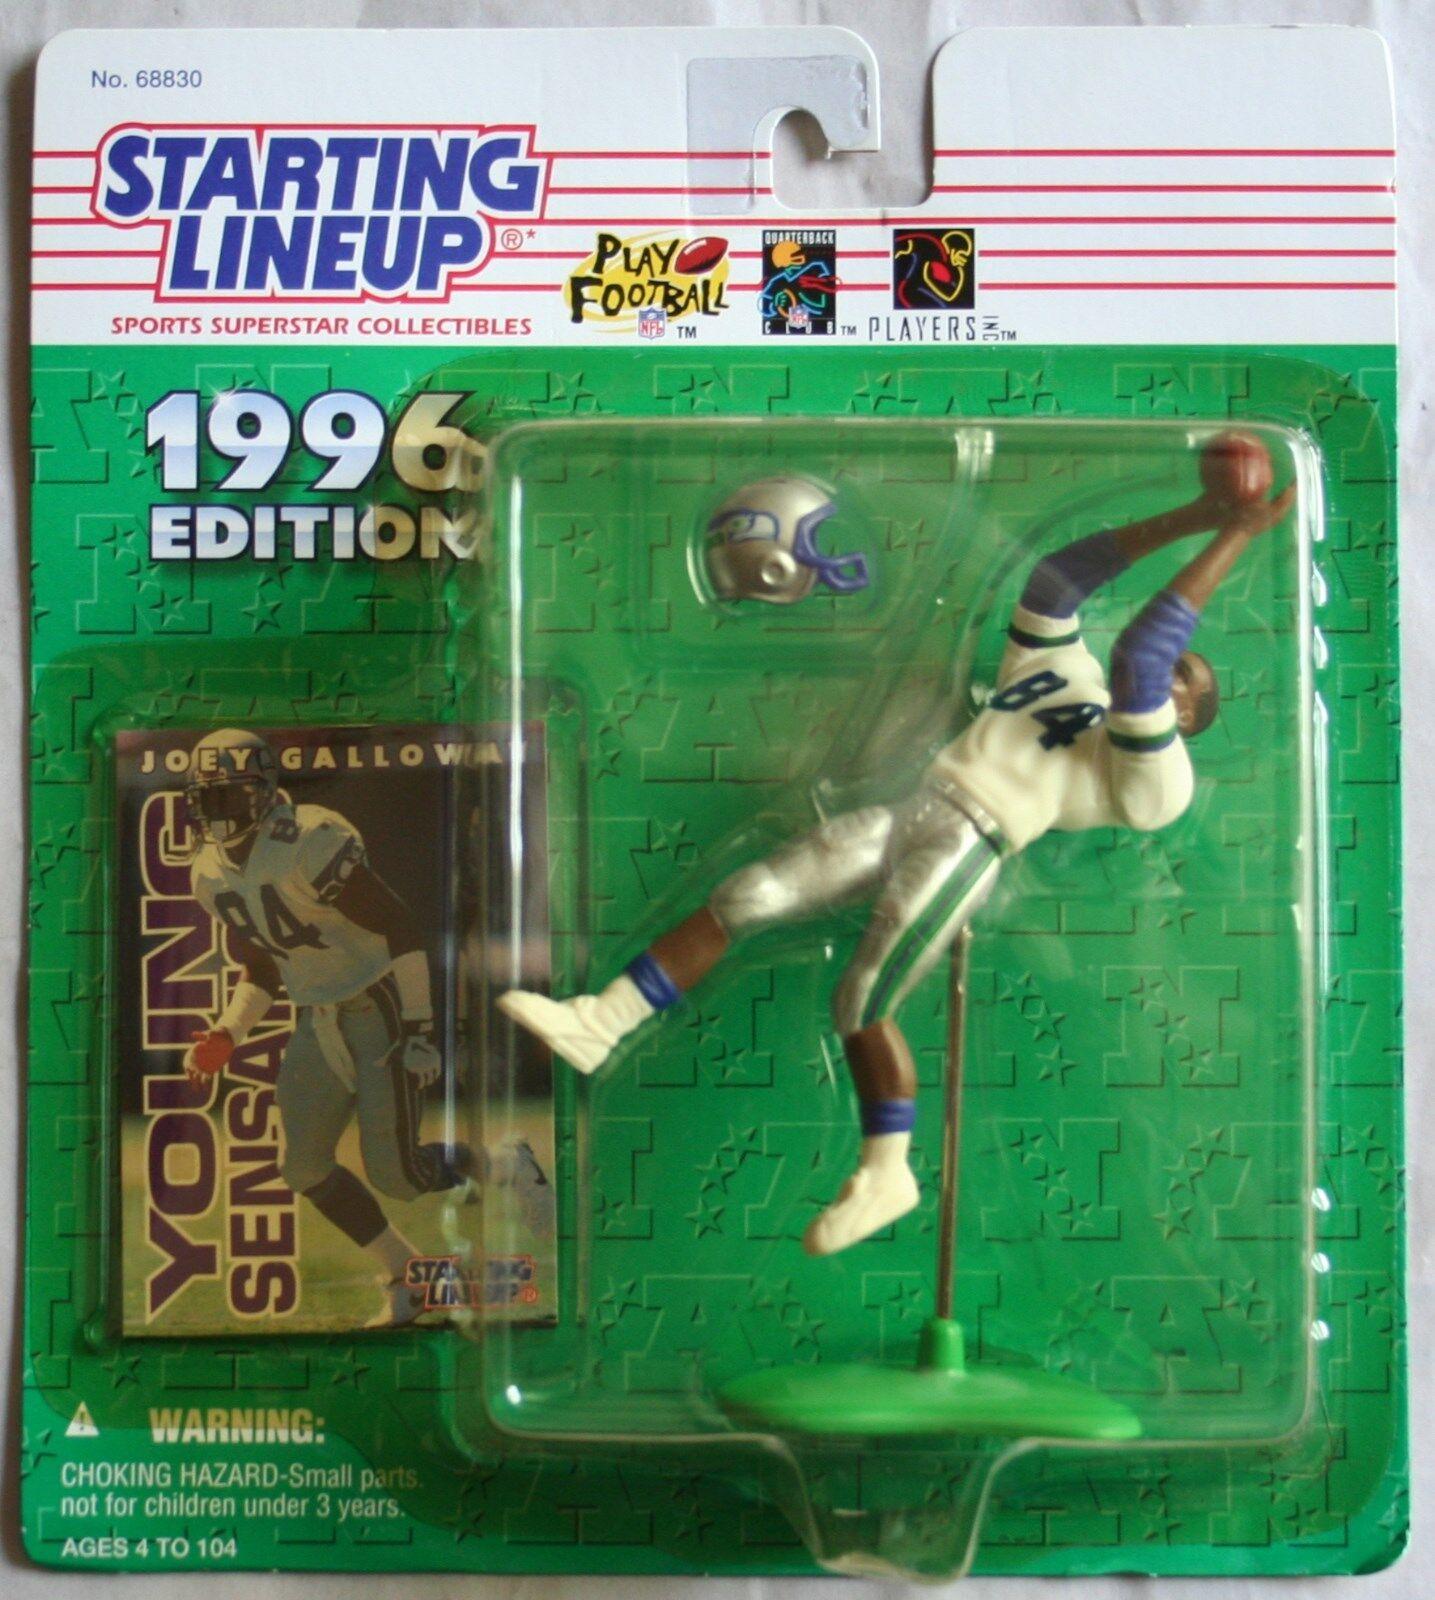 1996 edizione Estrellating Estrellating Estrellating Lineup (8) Different Footbtutti azione cifras&(1)Basketbtutti 34bc0b